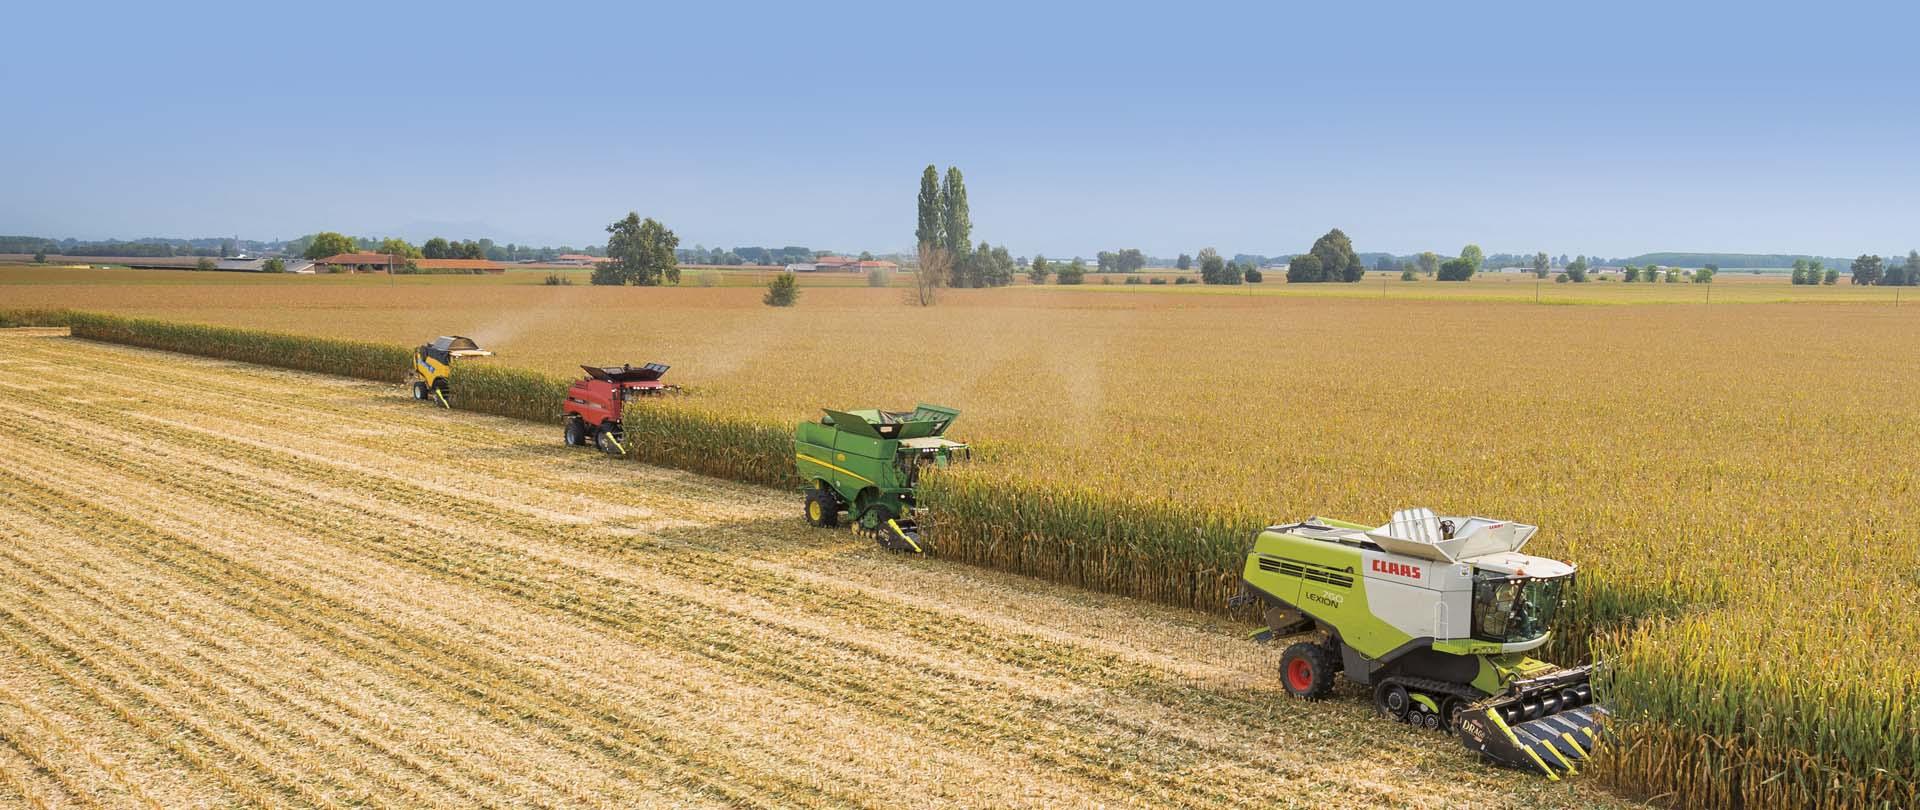 Olimac-drago-gt-testata-mais-mietitrebbia-claas-johndeerecase-newholland-laverda-corn-head-harvester-maispfluecker-maehdrescher-cabezal-maíz-cosechadora